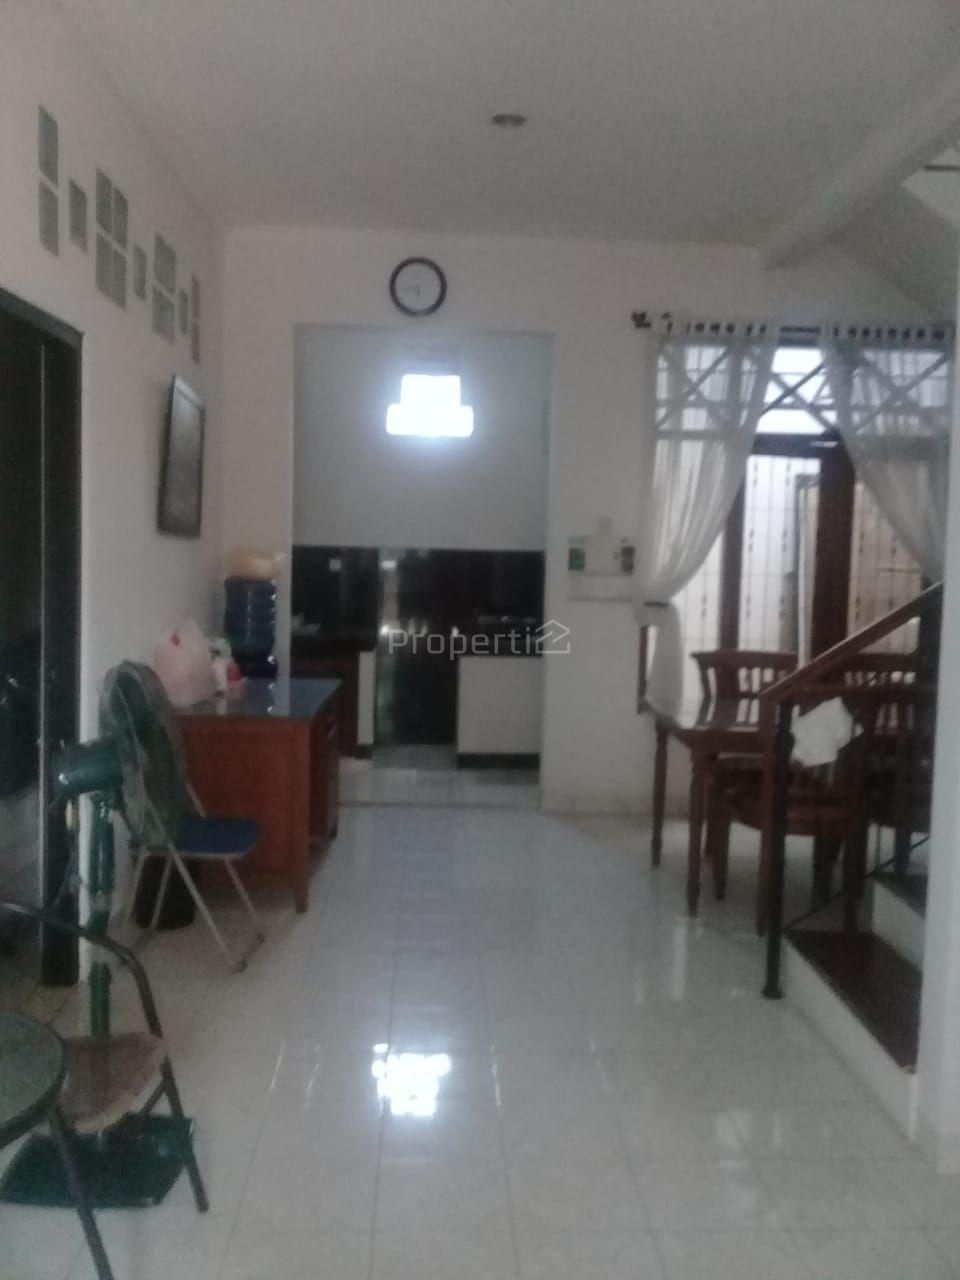 Favorite House in Residential Middle of Bogor City, Jawa Barat